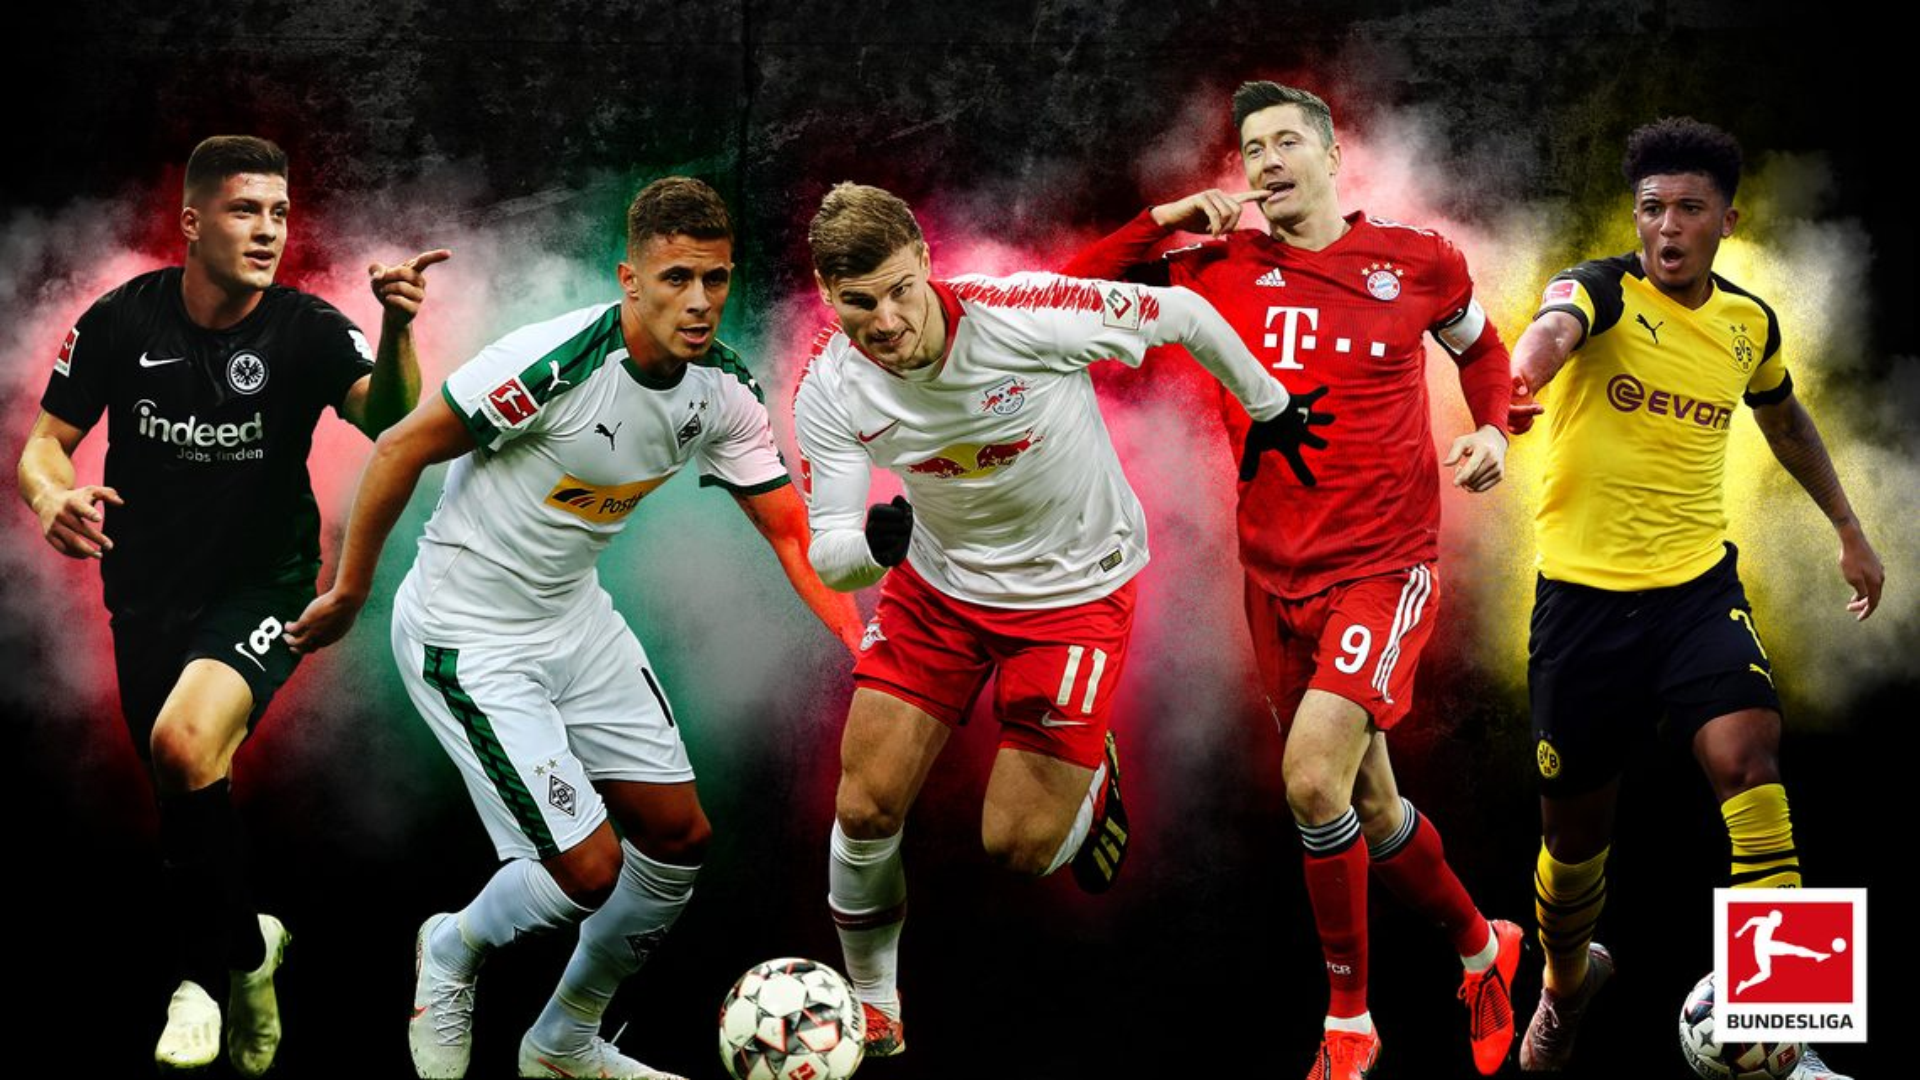 Bundesliga Summer Internationals Bundesliga Players With